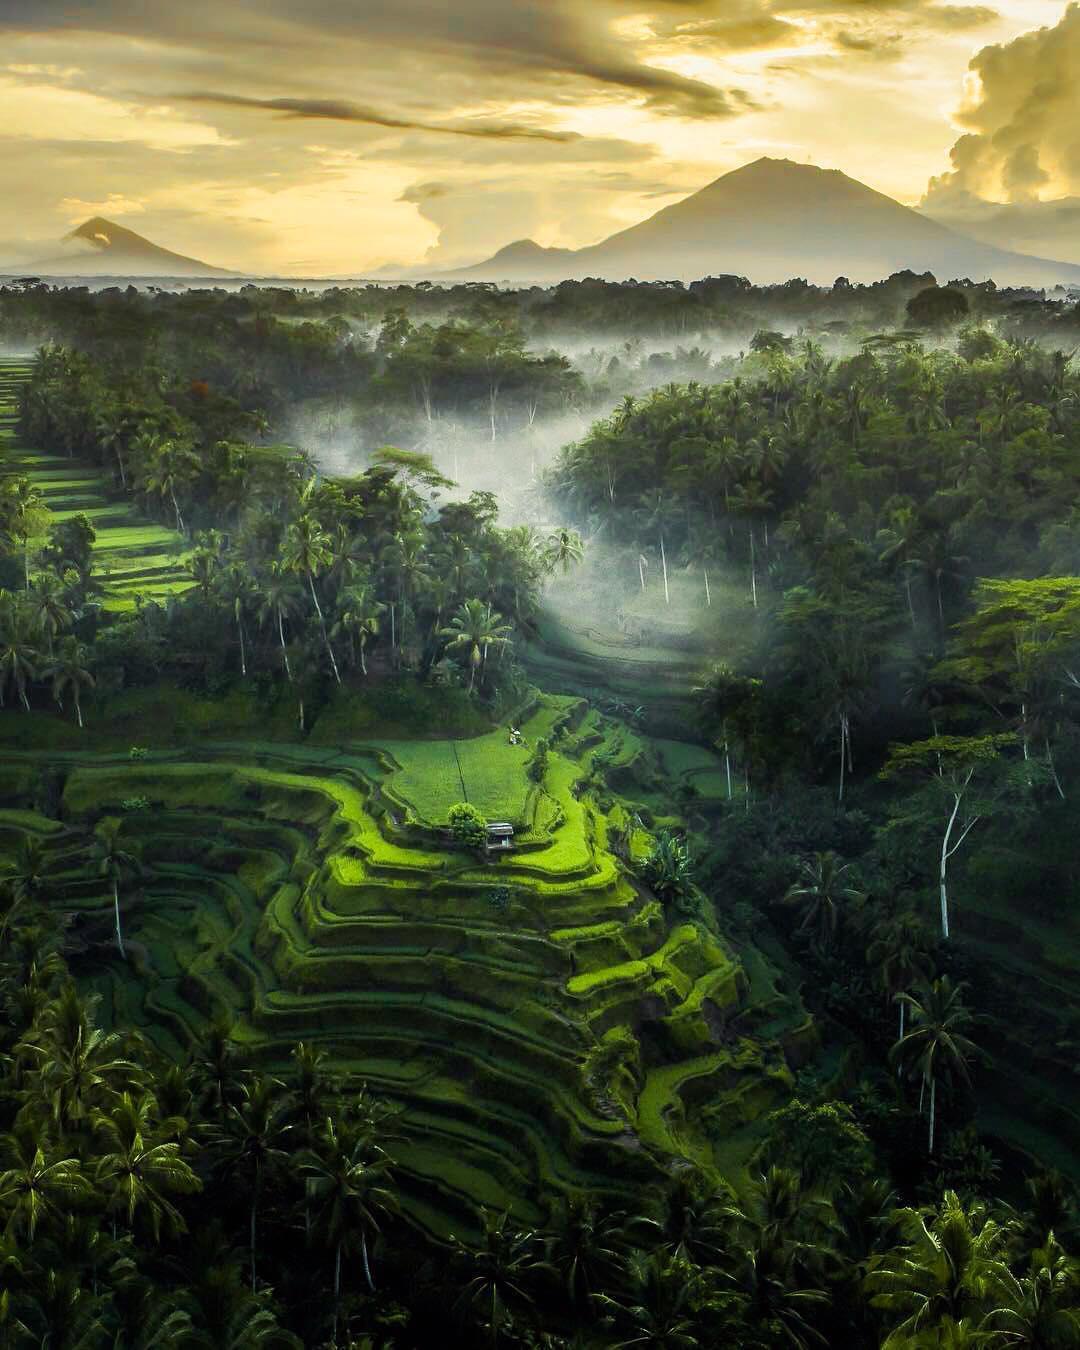 Activities in Bali; Tegalalang Rice Terraces